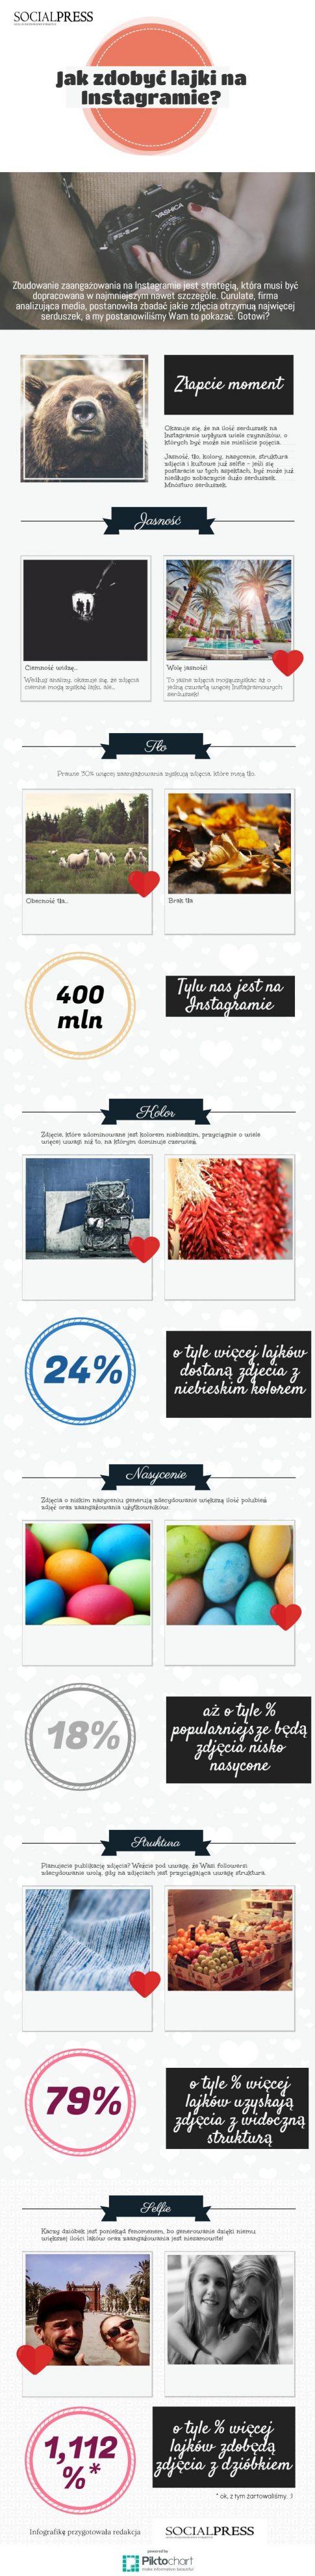 inforgrafika instagram